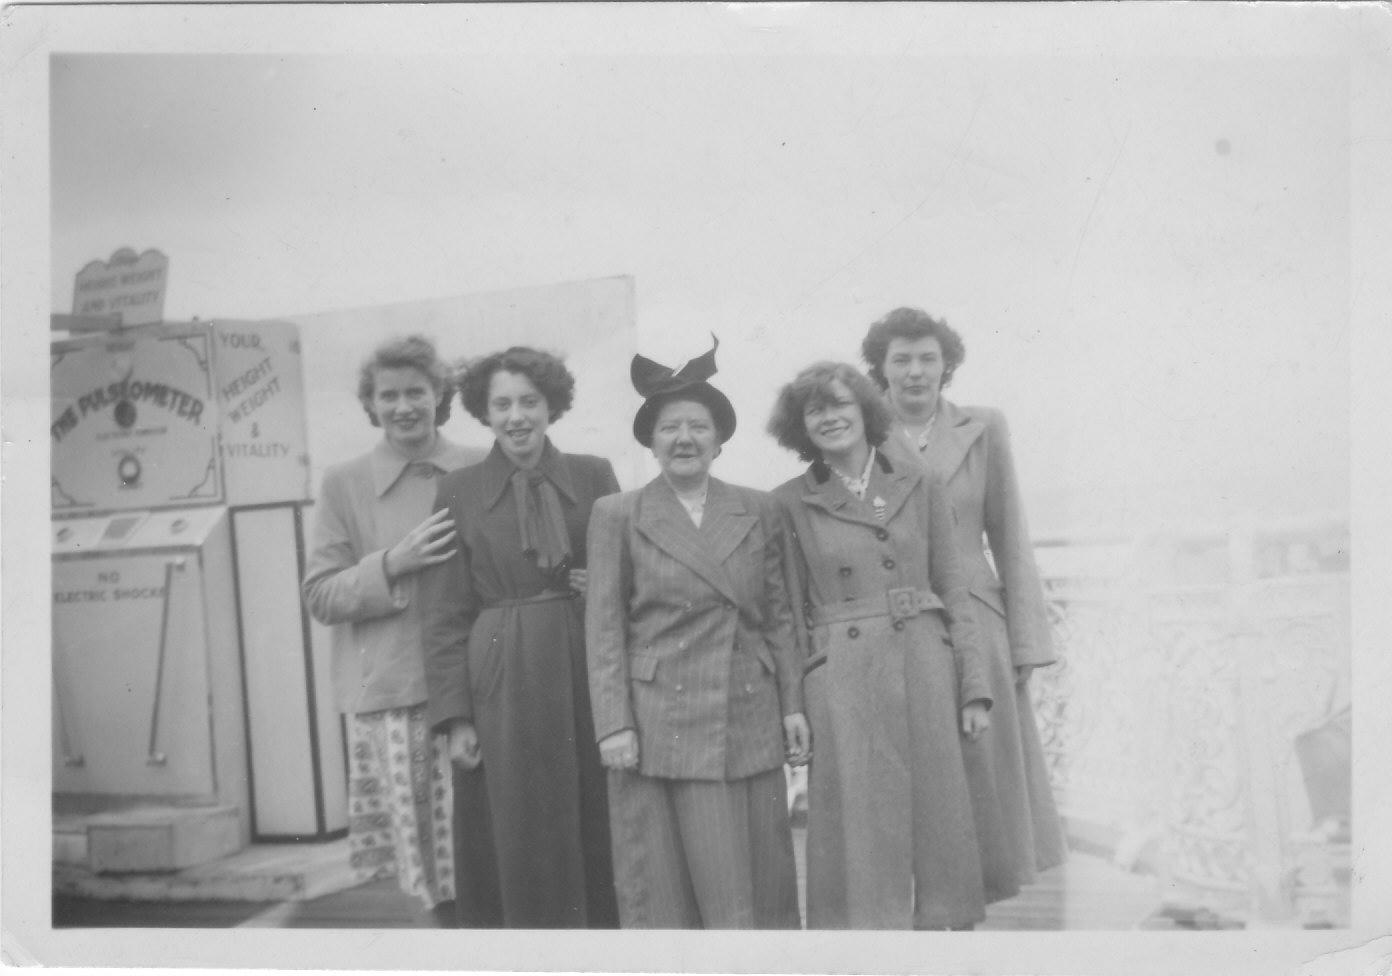 Gressenhall photos - Gladys Richmond ---- Hubbard, Matron White, Doris (1392px x 976px)